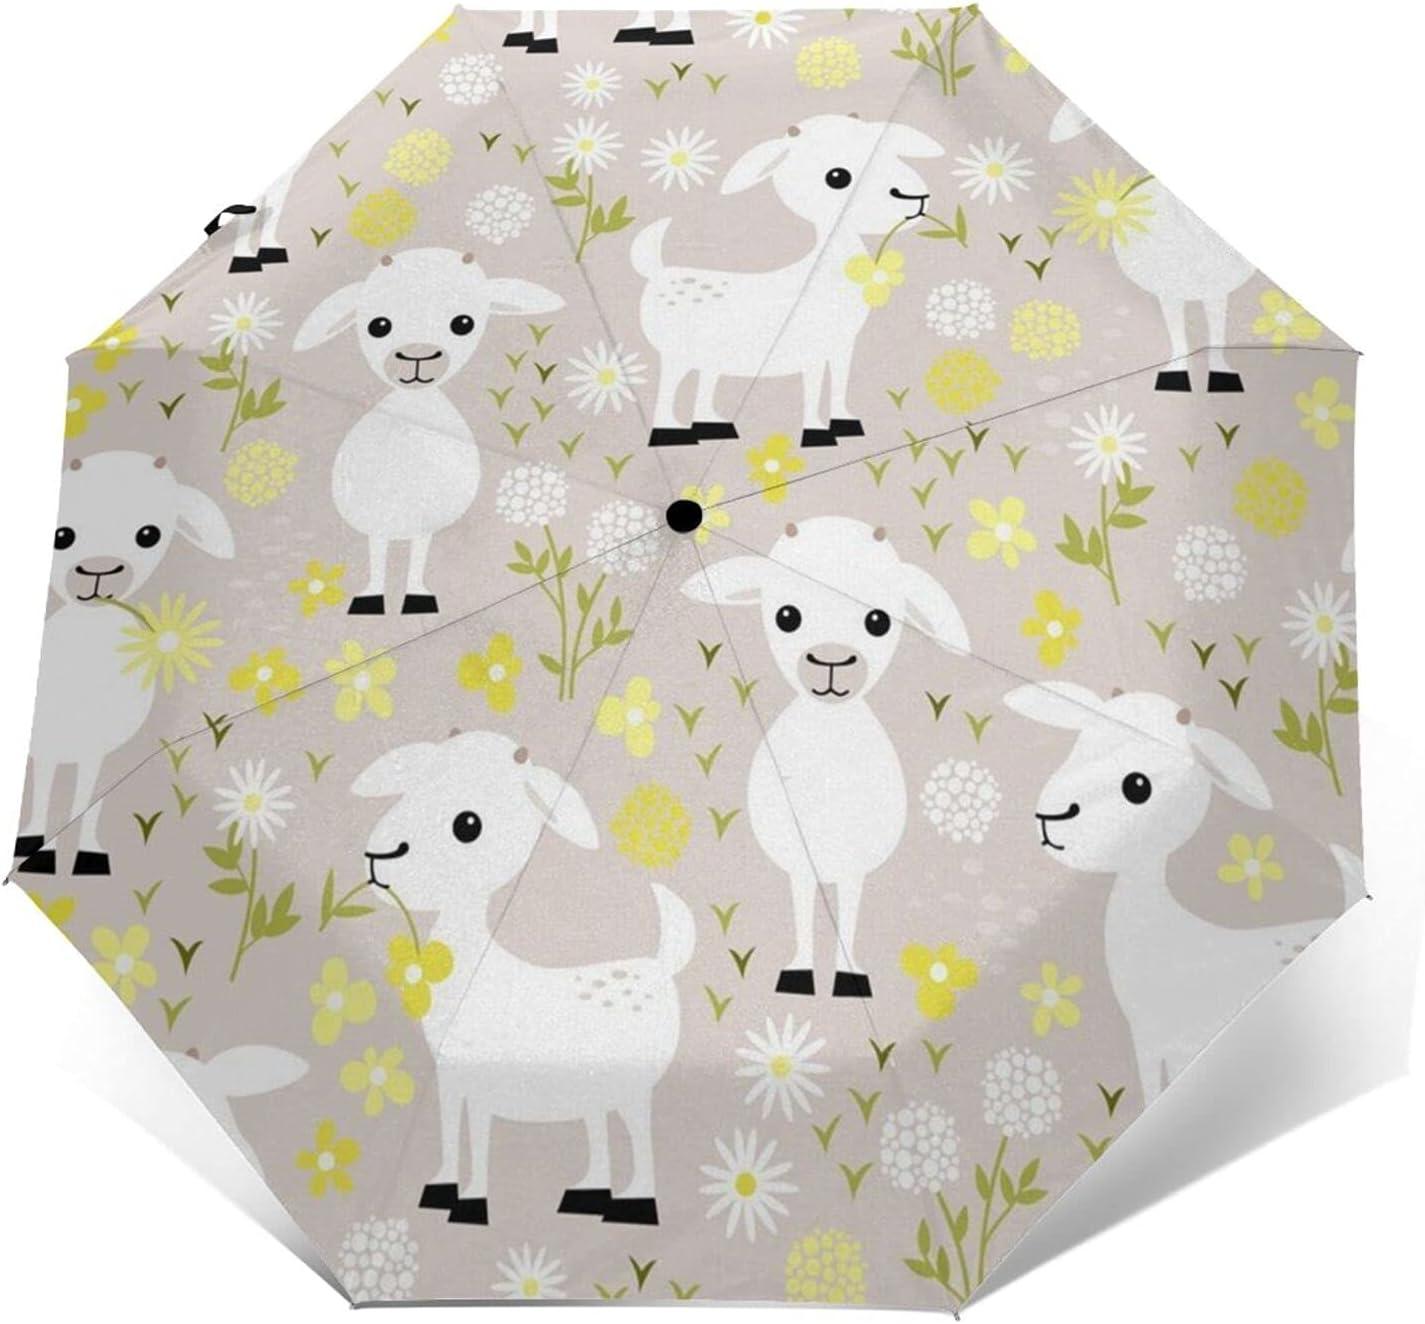 NEWKOW Travel Folding Max 48% OFF Umbrella Automatic Tri-Fold a Men Open Sale item for